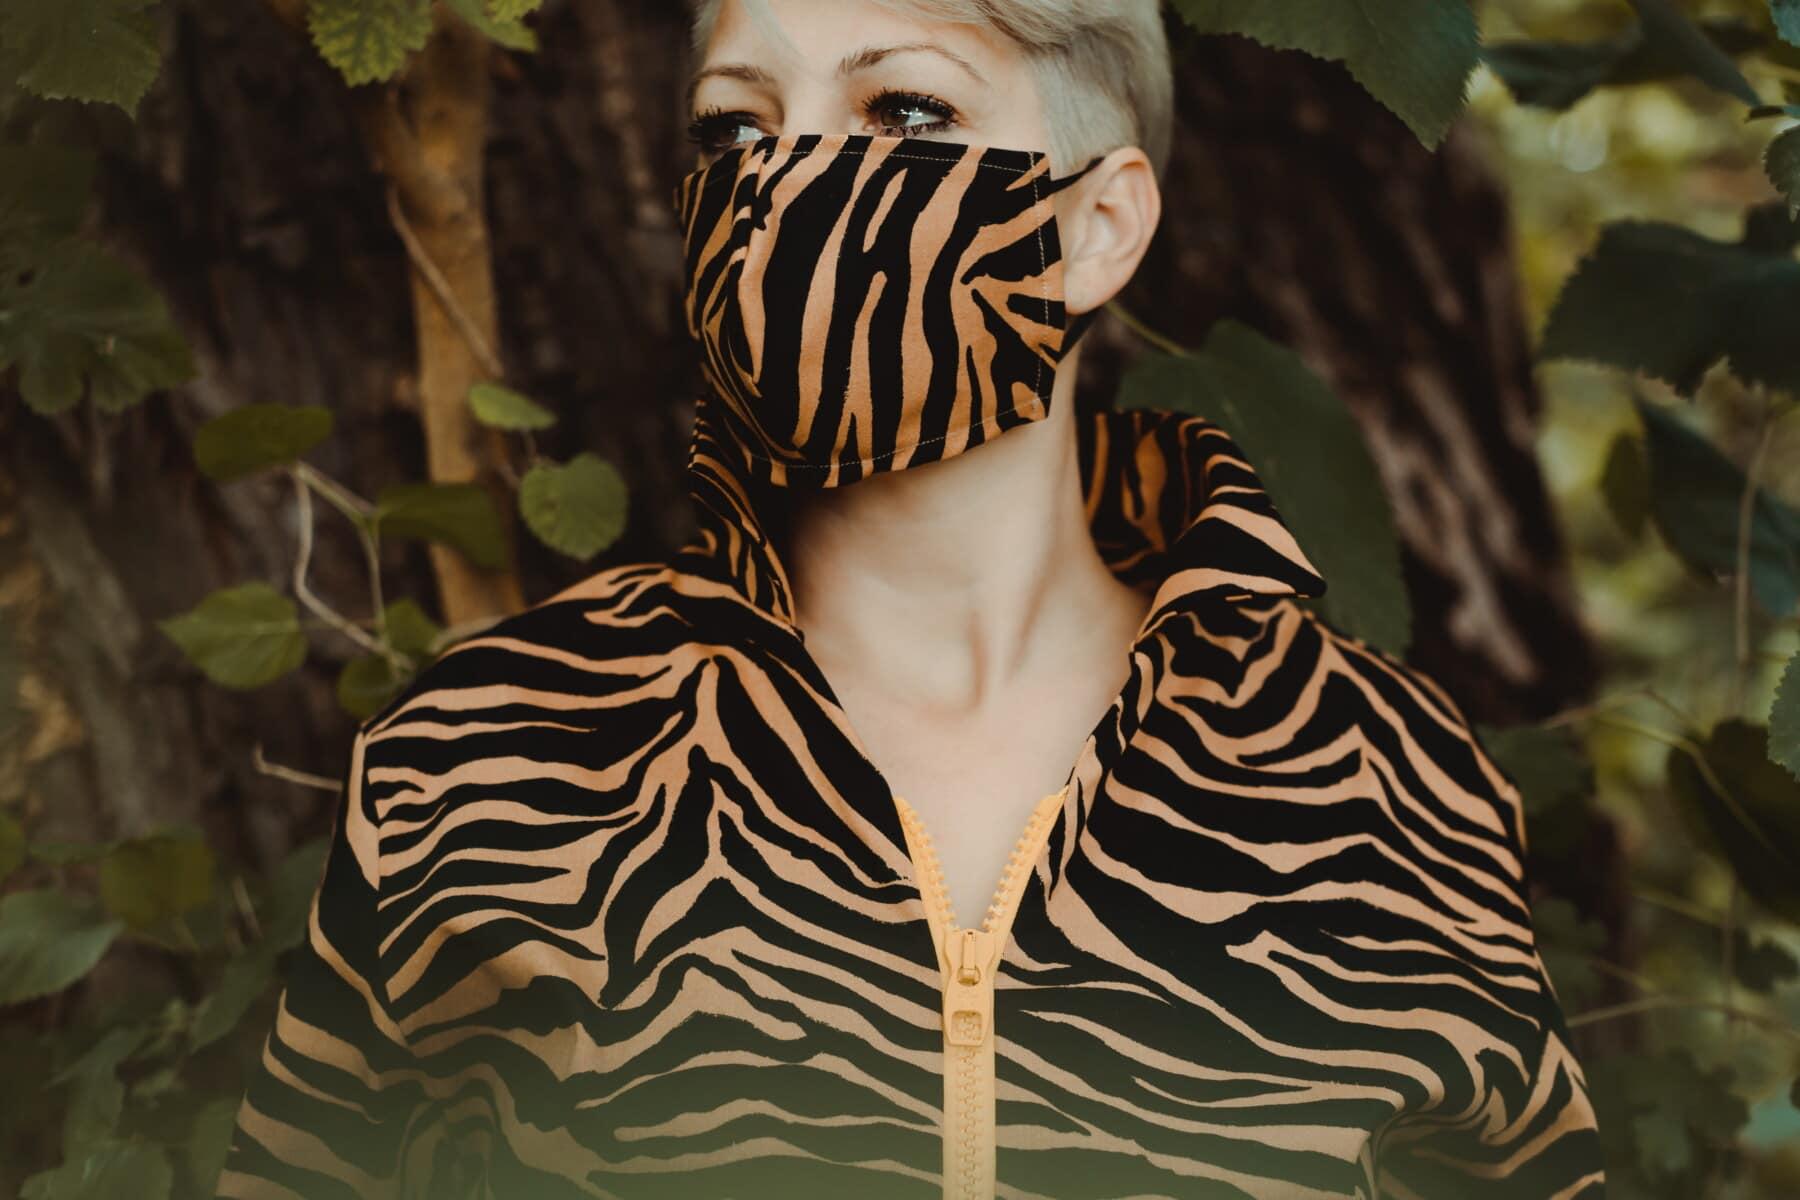 Gesichtsmaske, moderne, Outfit, Design, Camouflage, Mode, Coronavirus, COVID-19, Natur, Porträt